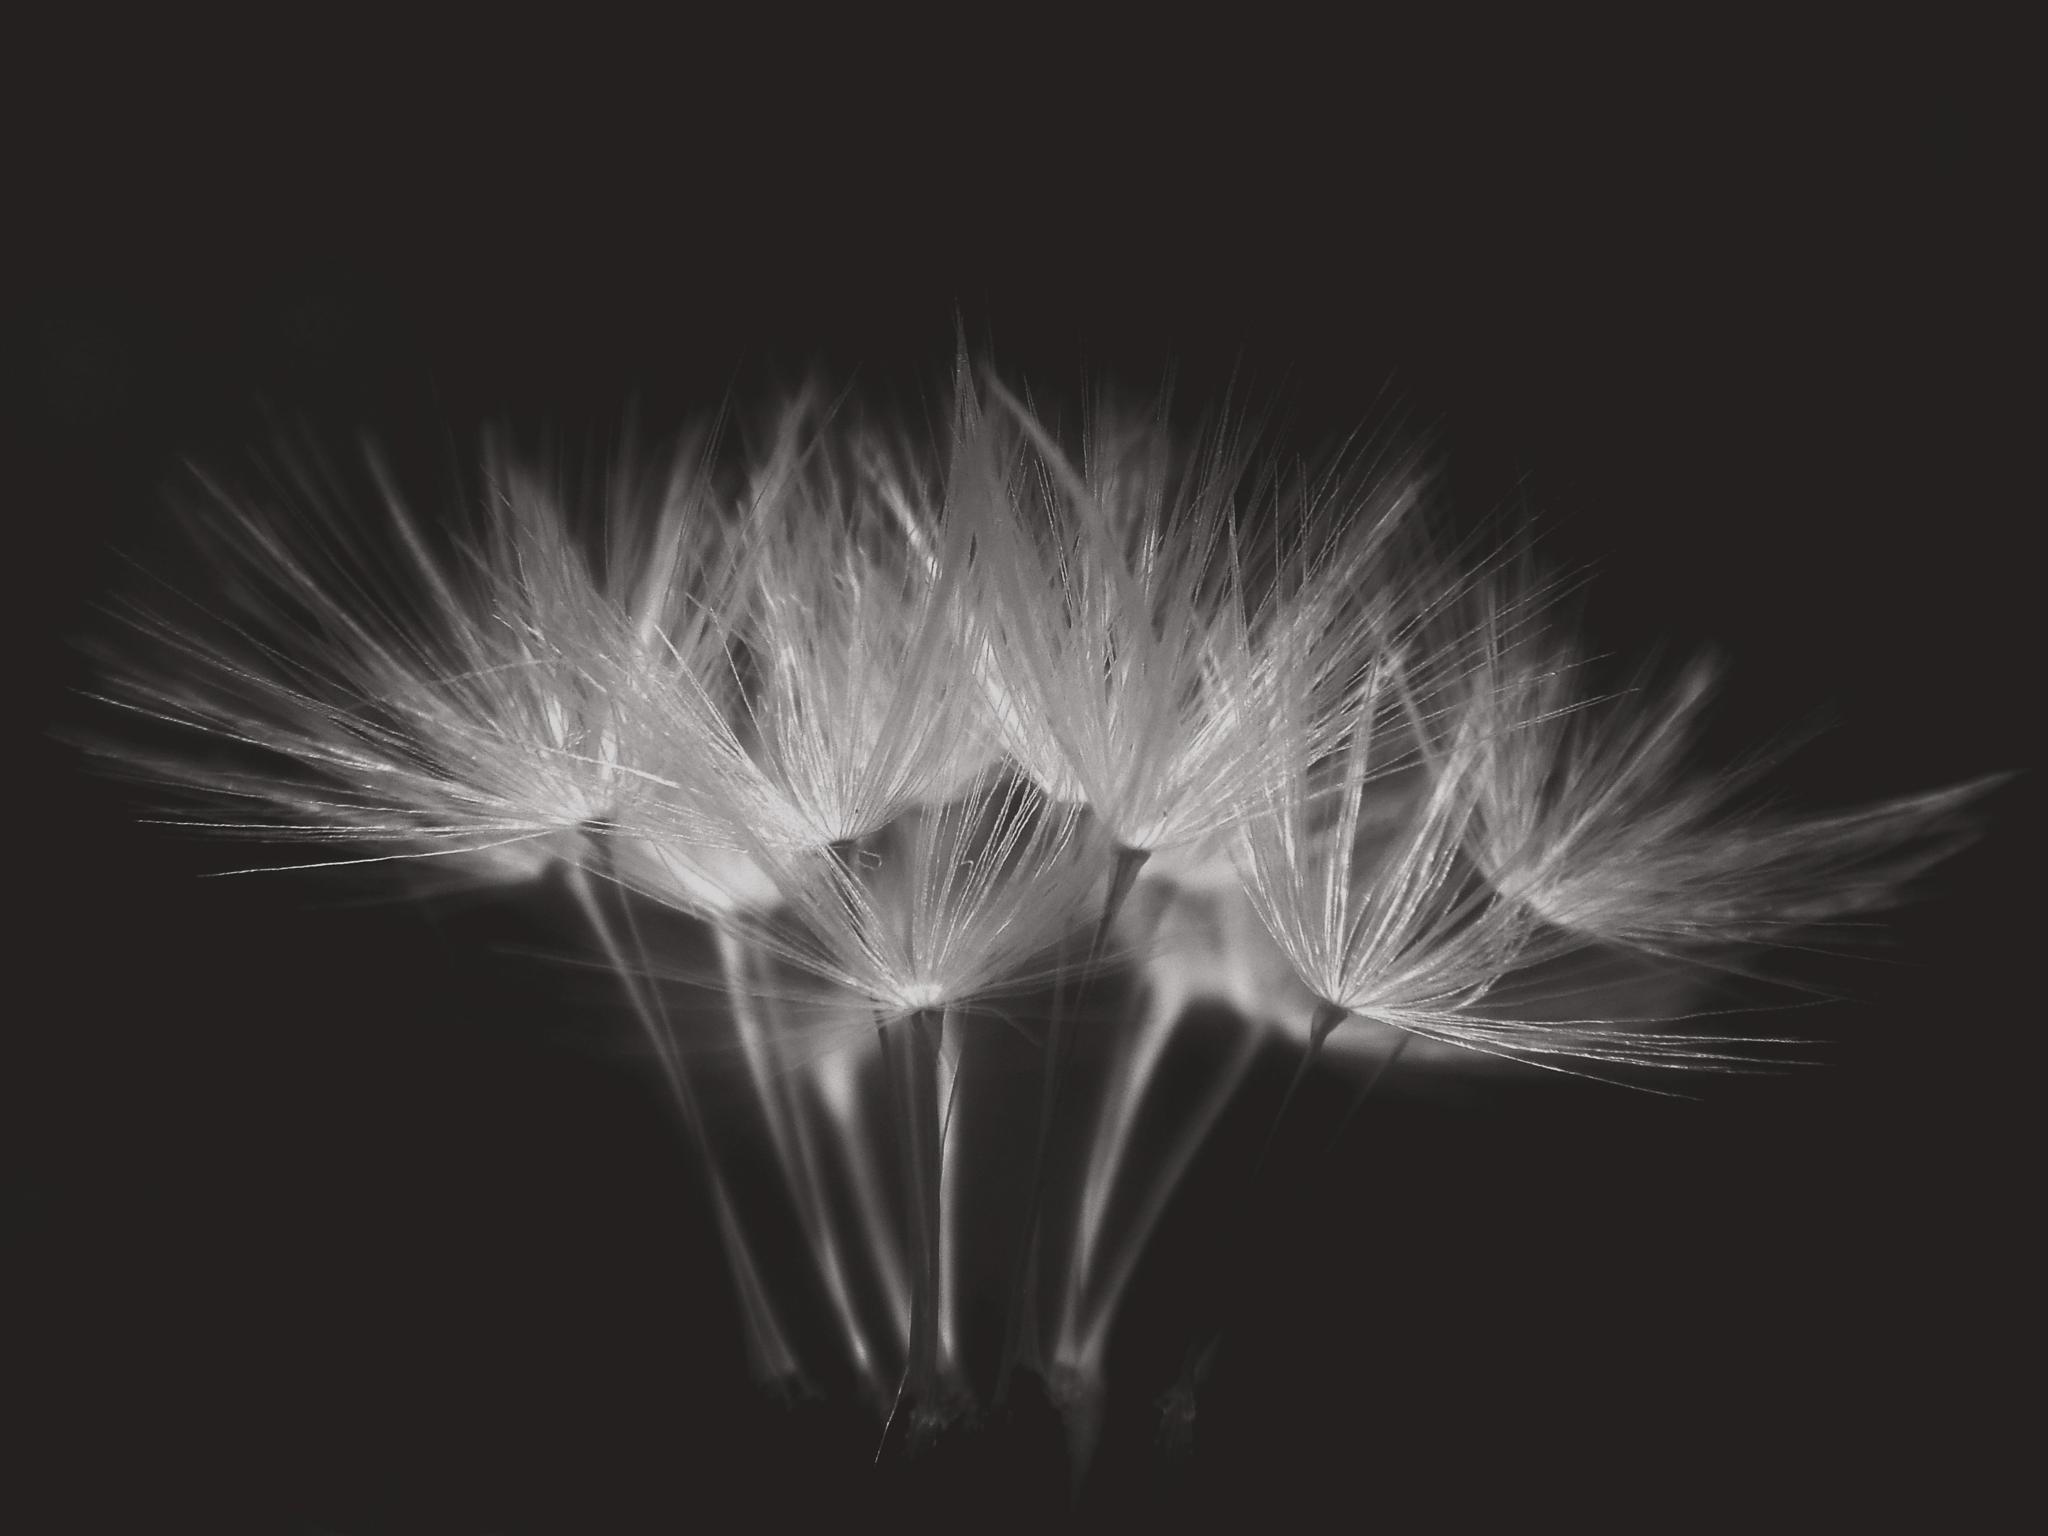 Untitled by Eryka Hende